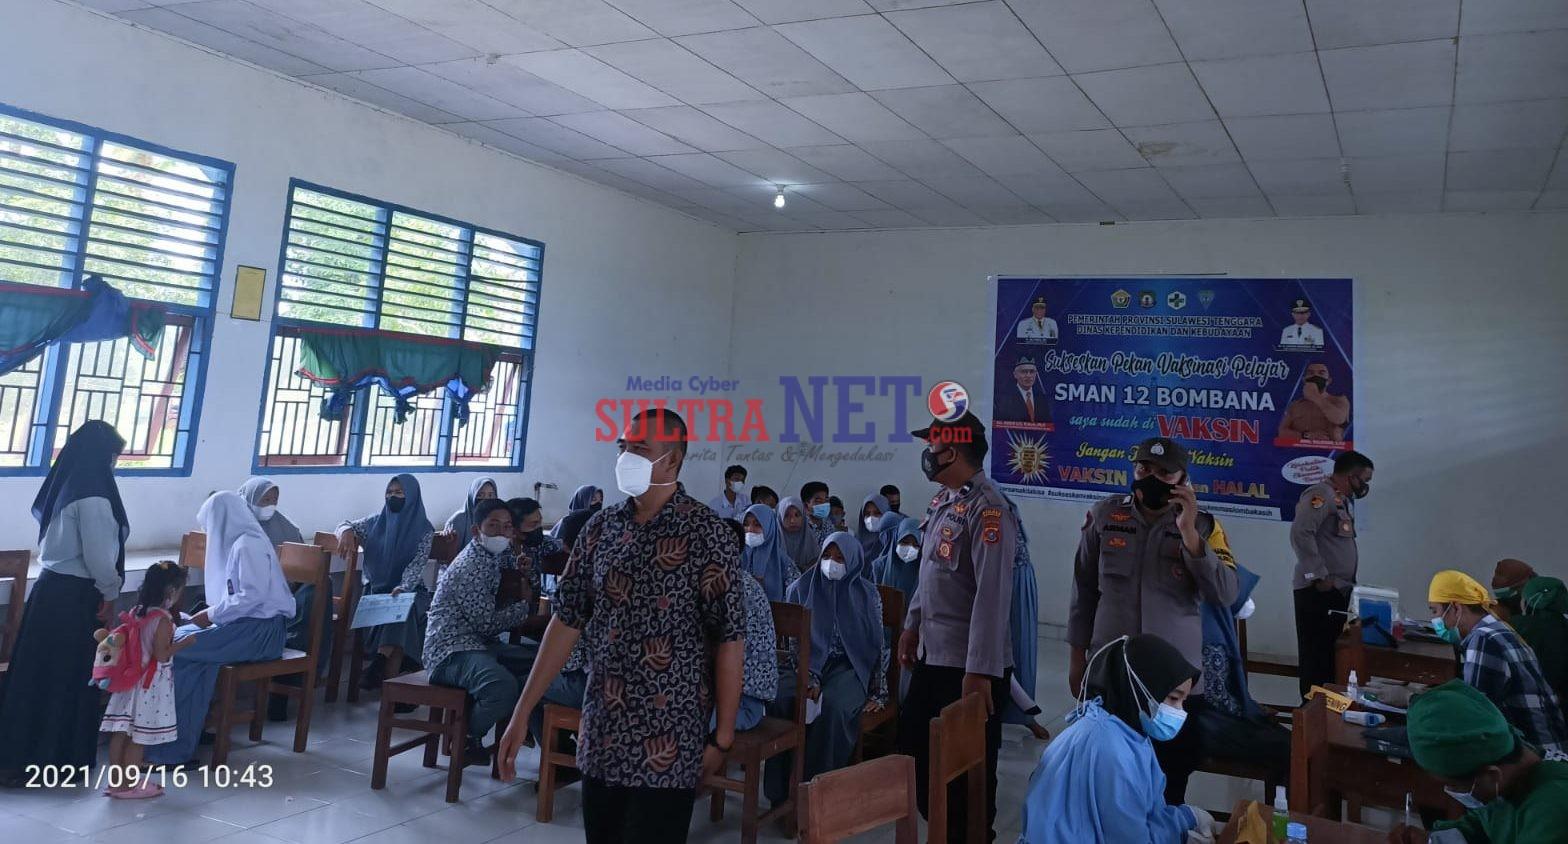 Kepala Sekolah SMAN 12 Bombana, Amal Sulaeman, S.Pd saat meninjau pelaksanaan vaksinasi di sekolahnya